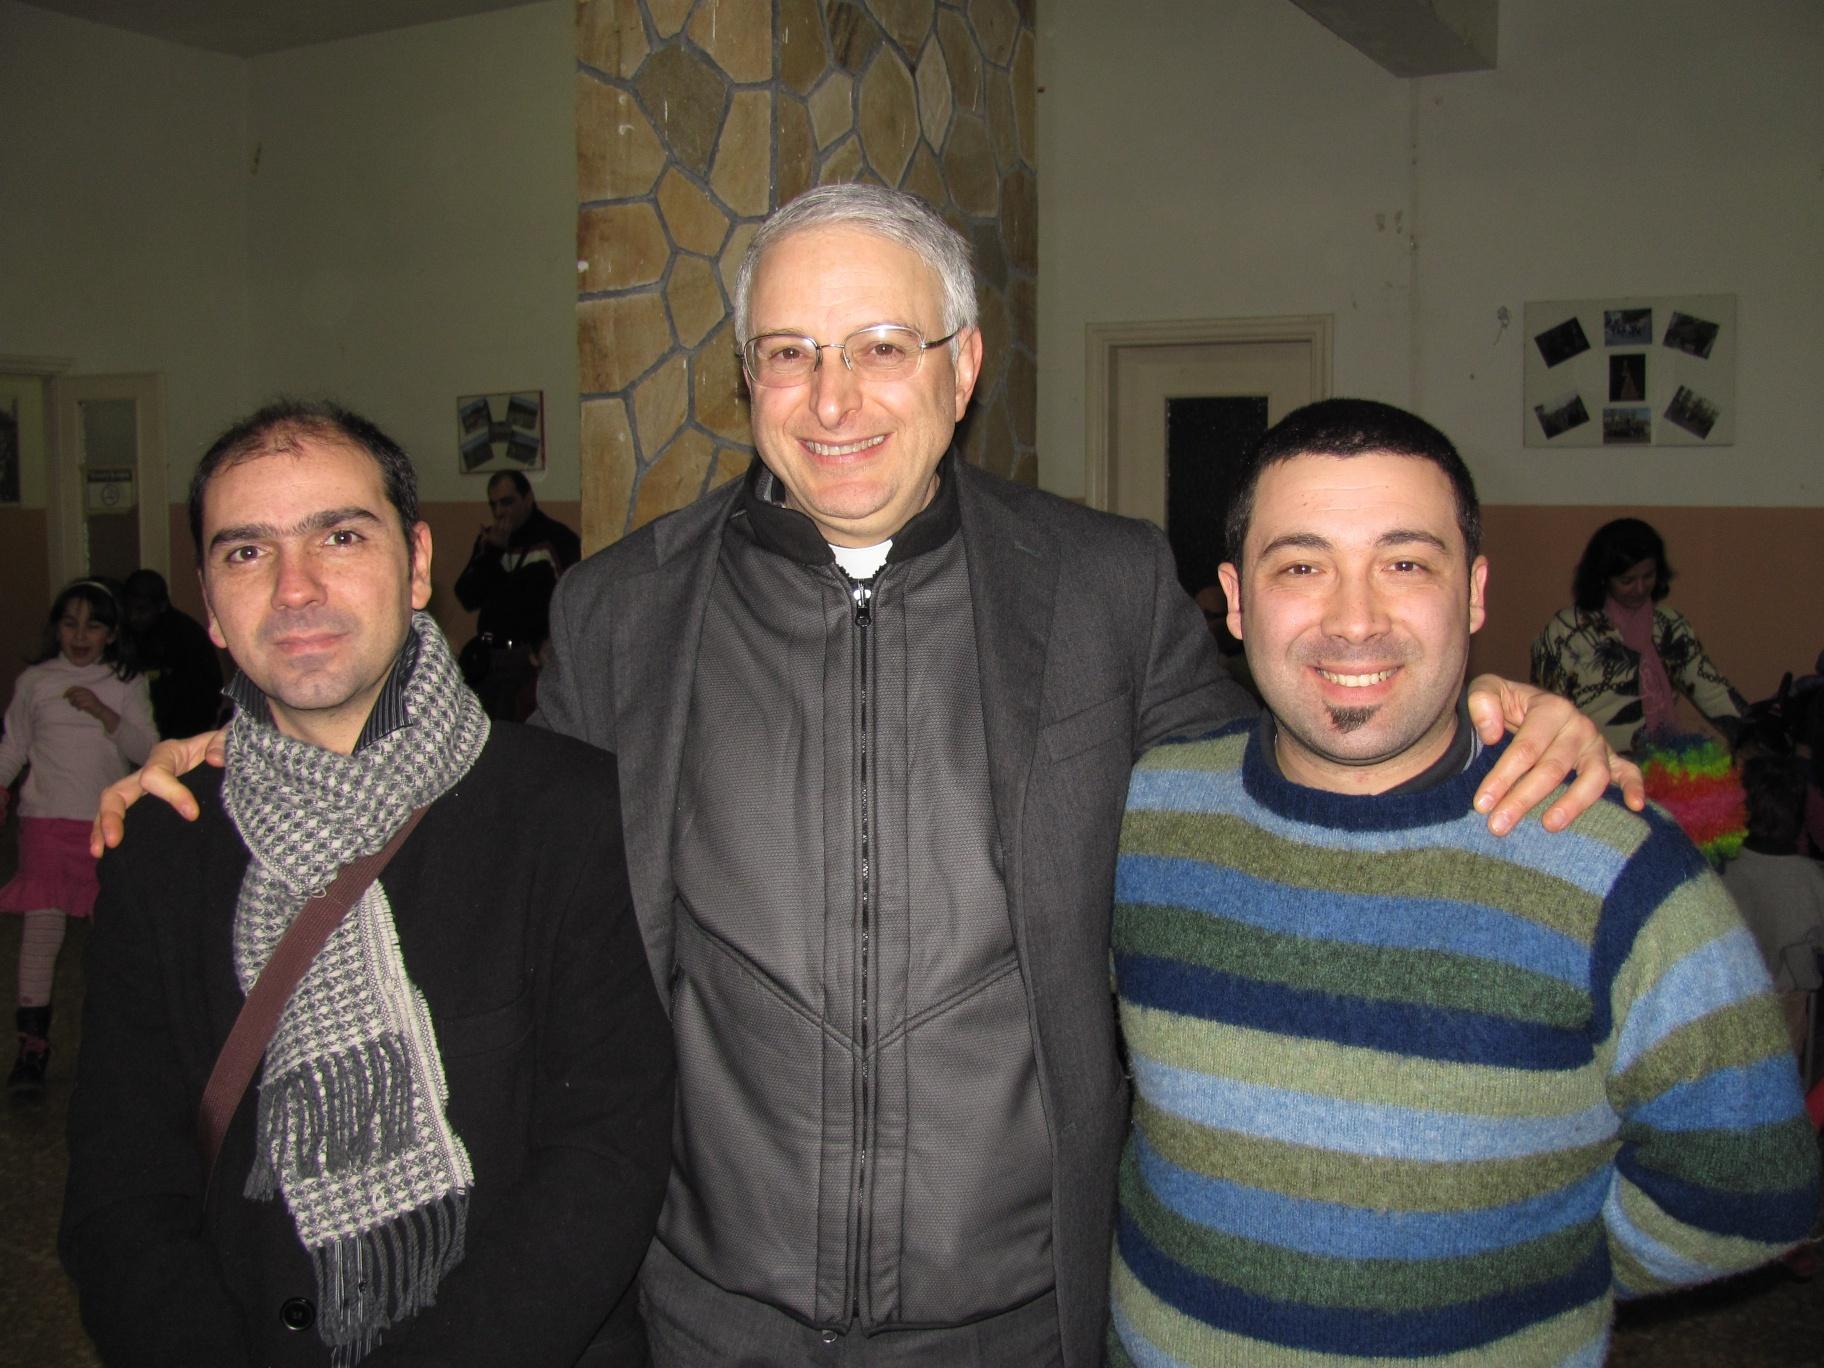 ricordo_battesimo_gesu_2011-01-23-17-06-49